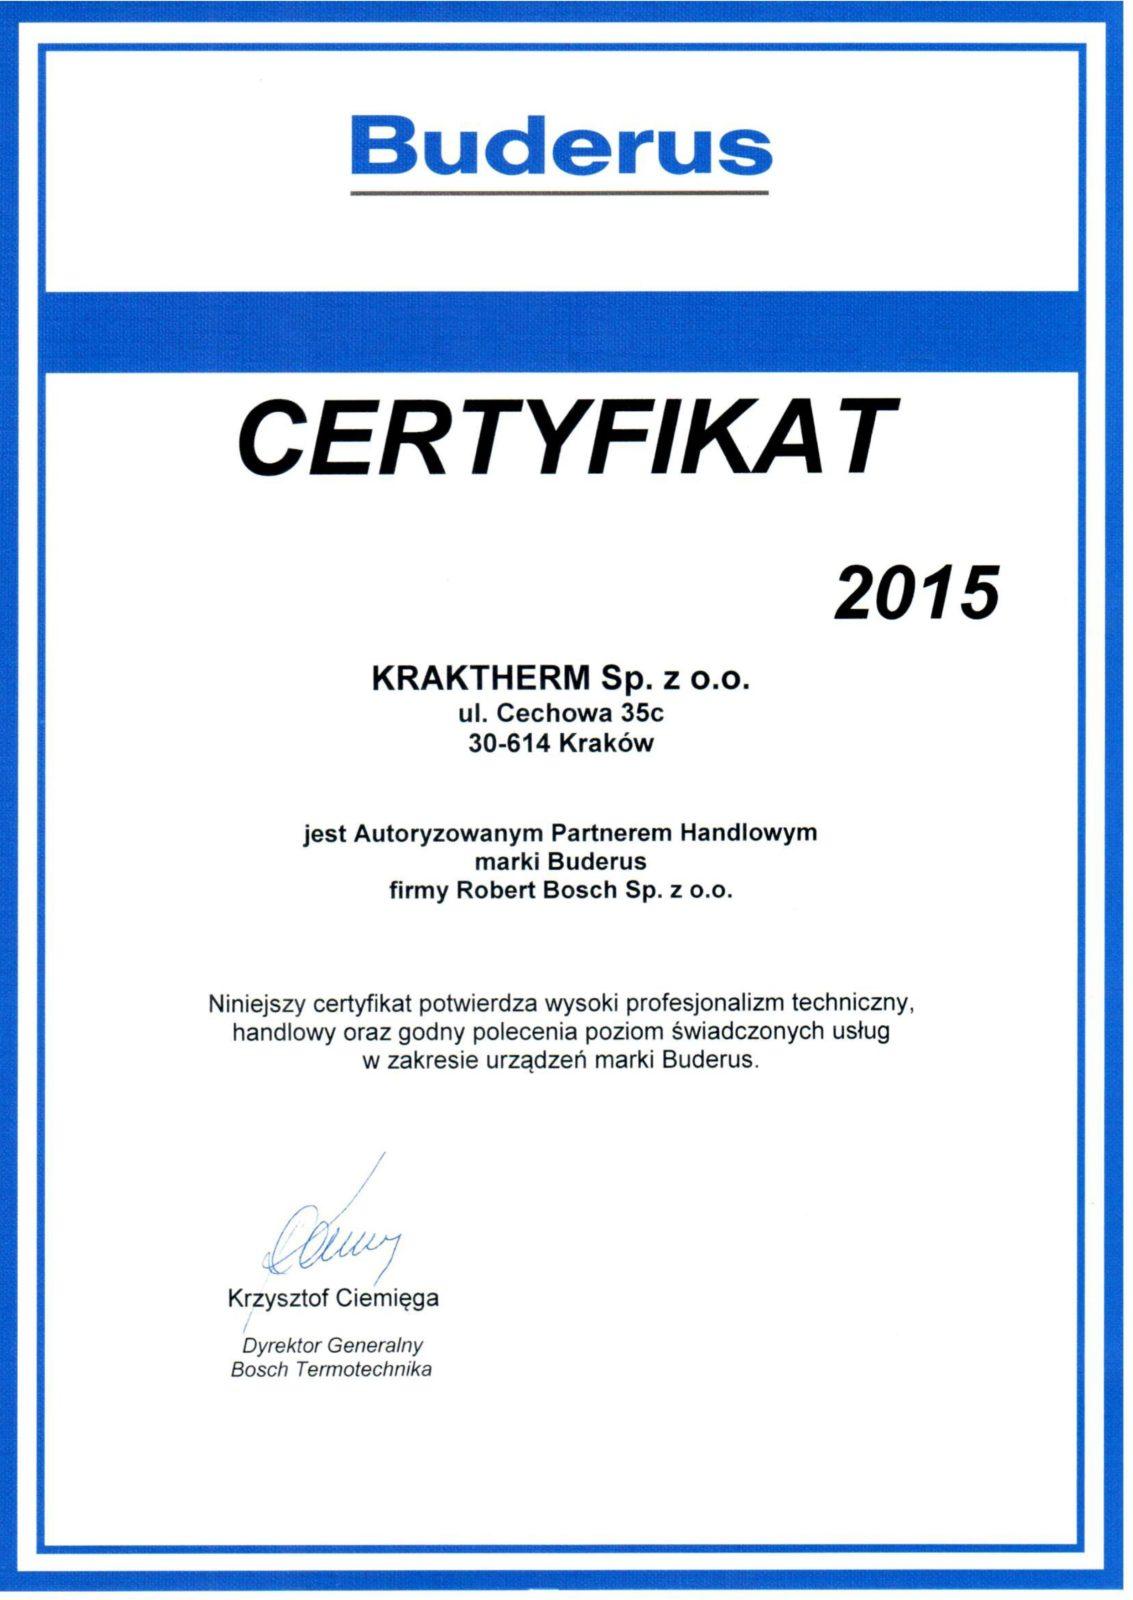 buderus certyfikat